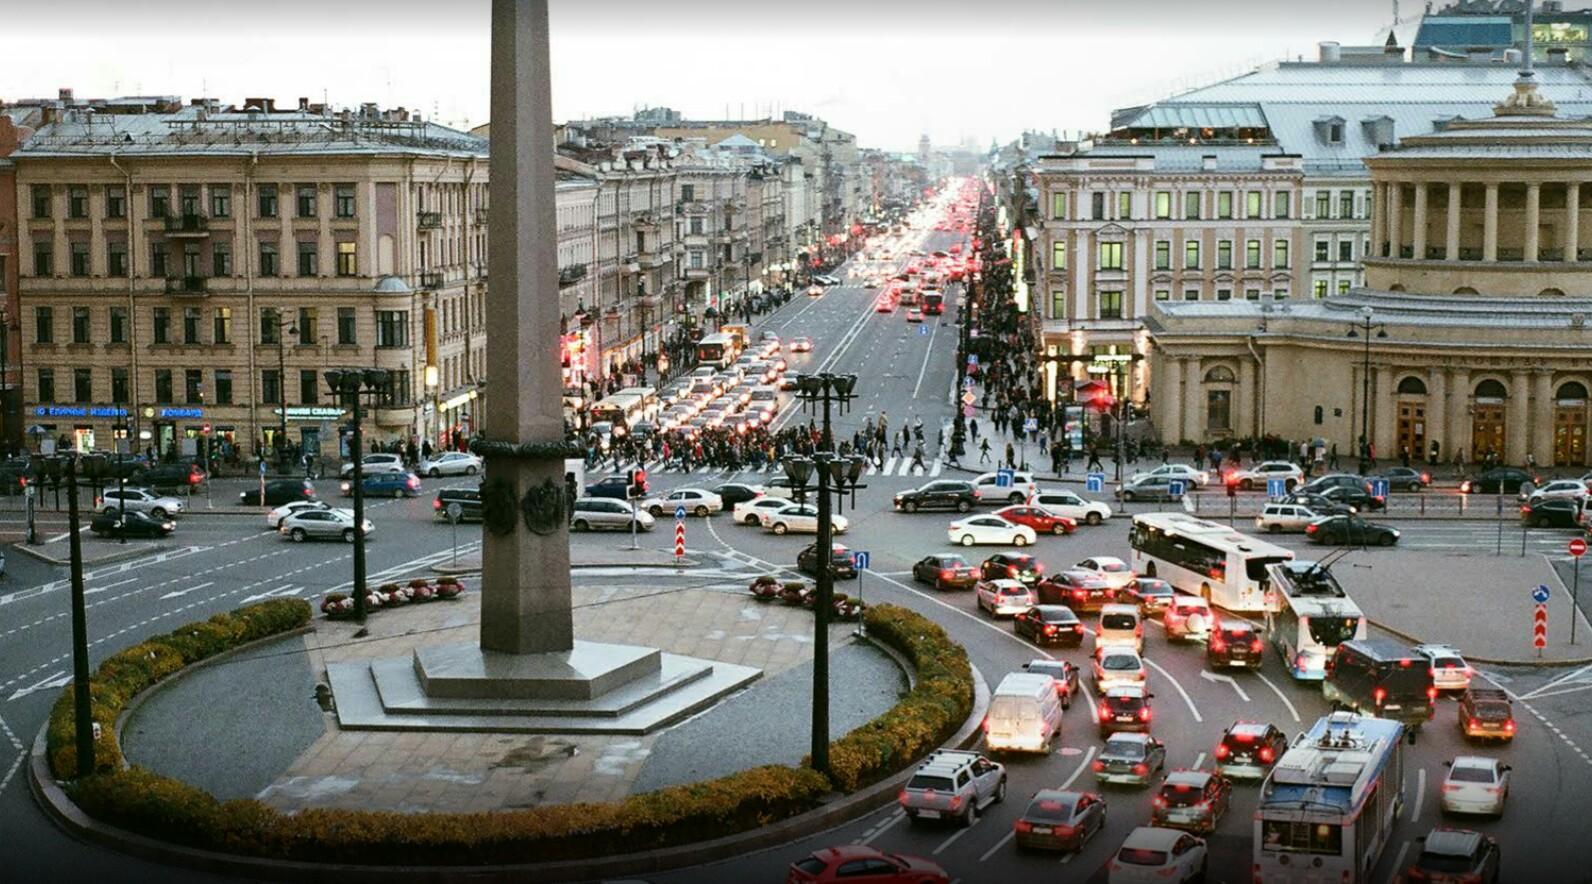 Площадь Восстания Петербург